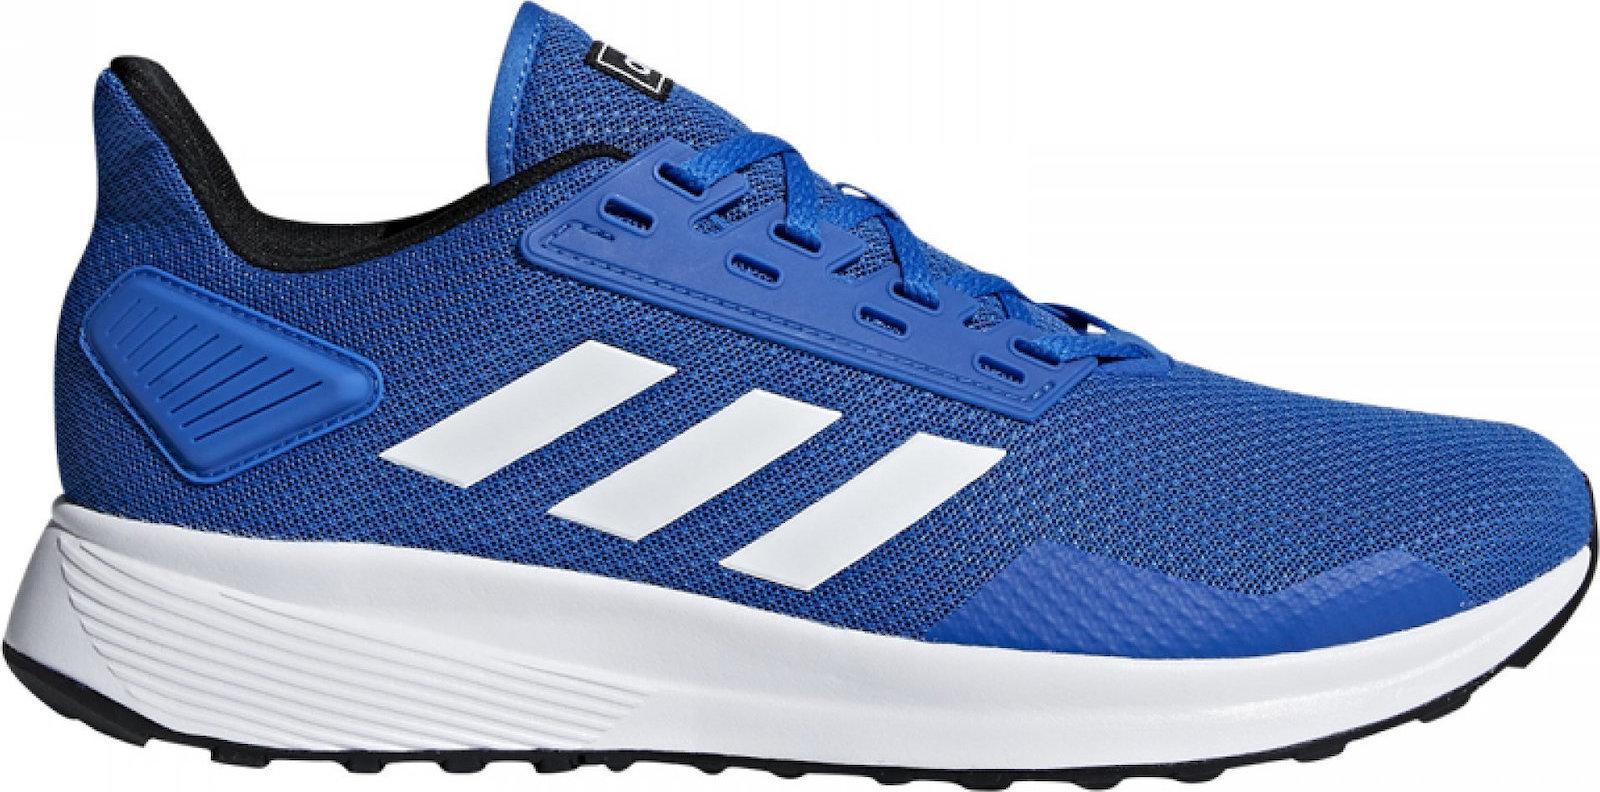 Adidas Duramo 9 BB7067